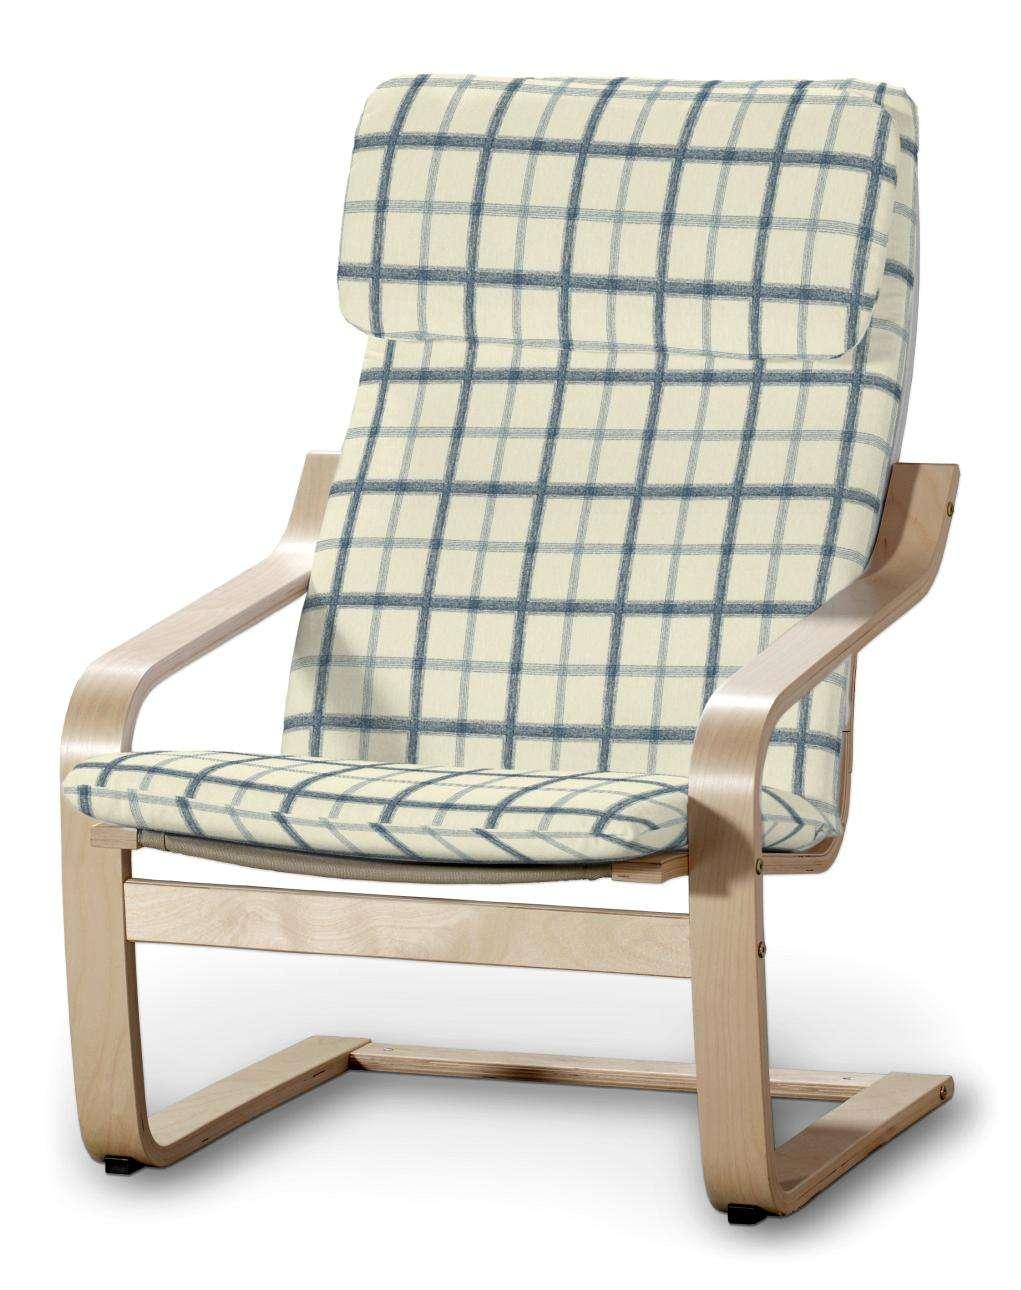 Poduszka na fotel Poäng Fotel Poäng w kolekcji Avinon, tkanina: 131-66